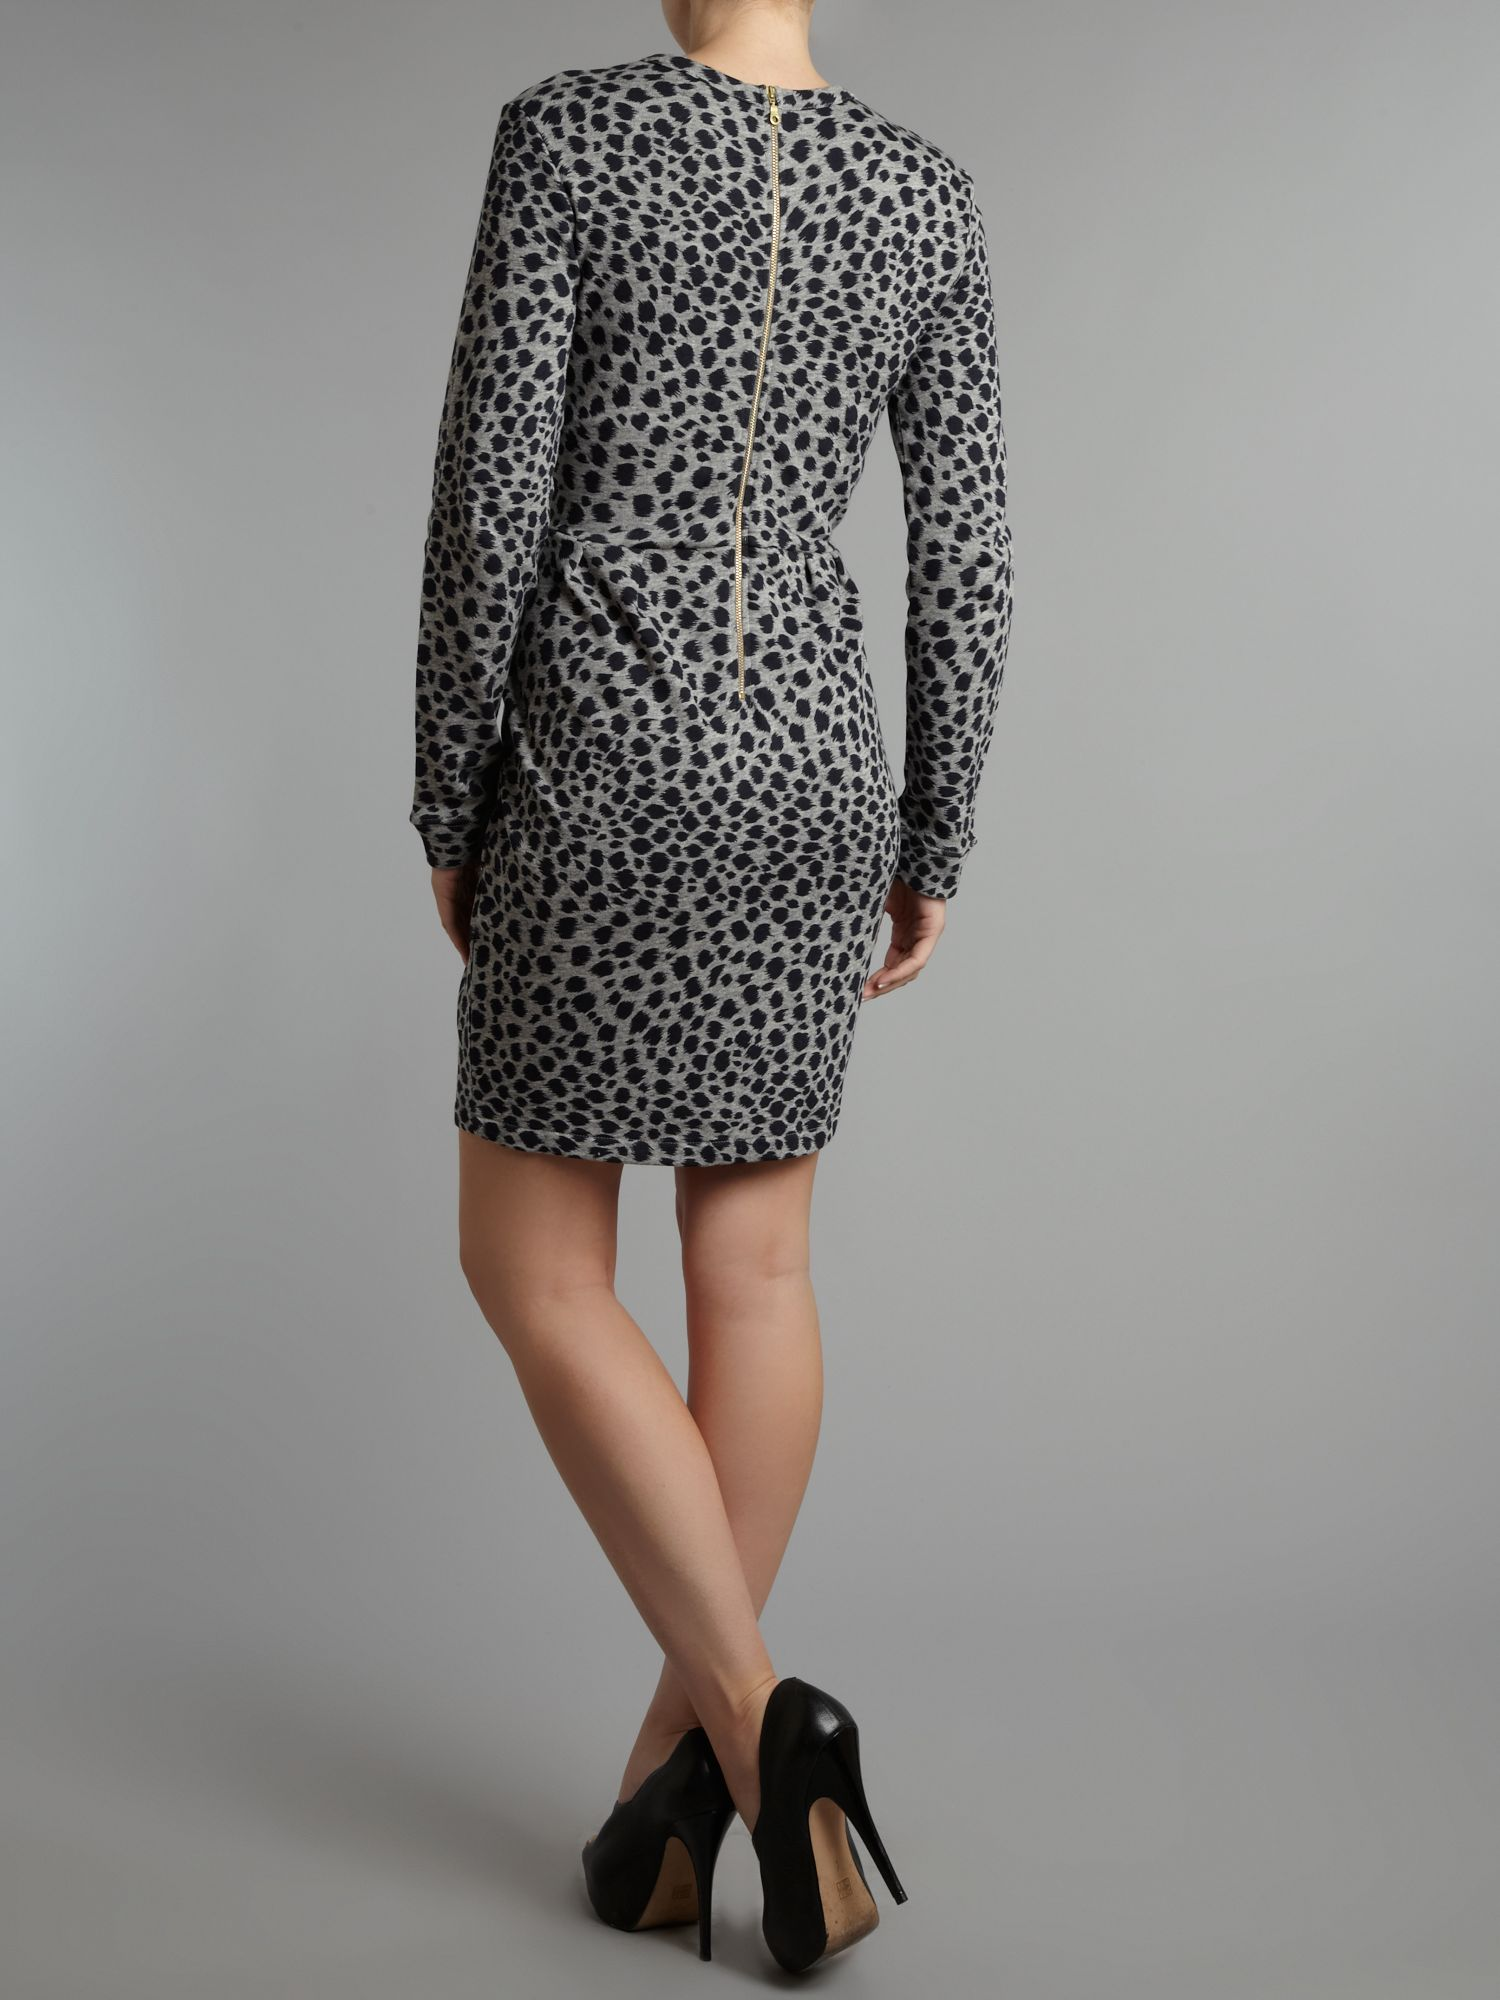 Whistles Dotty Cheetah Print Dress in Grey